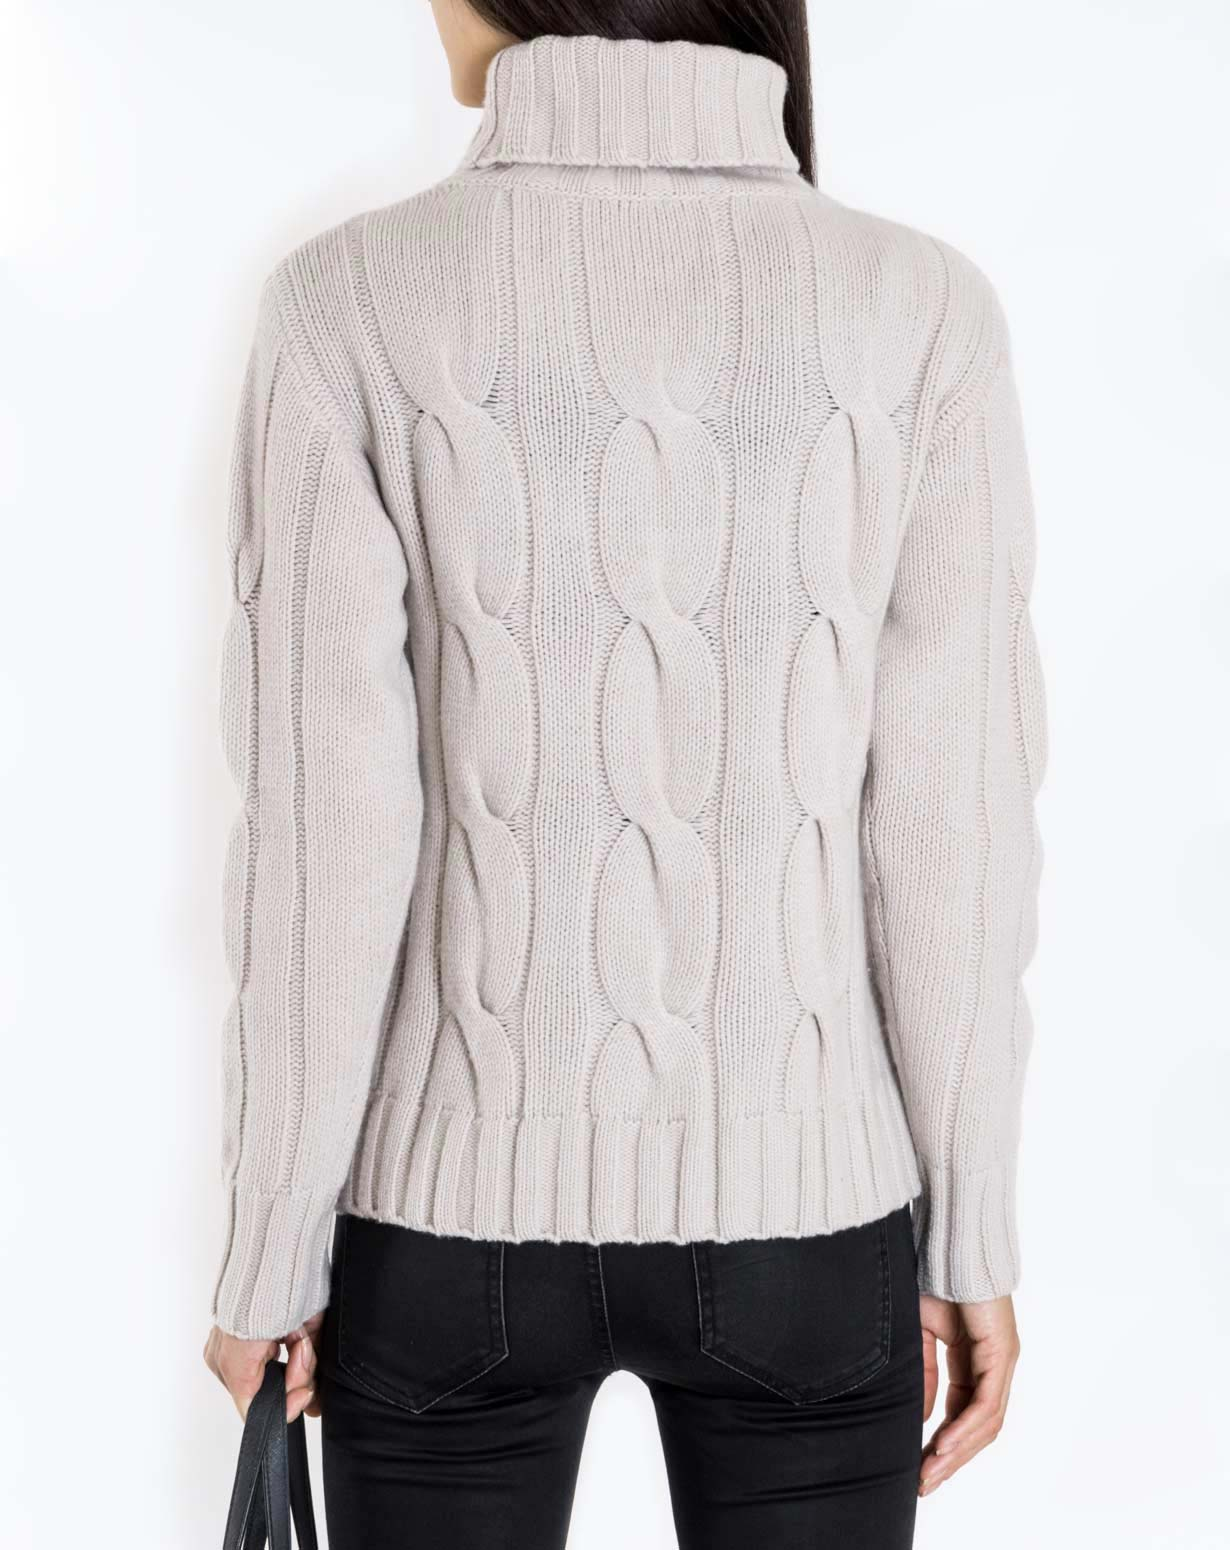 e3b344f66e Women s Pure Cashmere Cable Knit Turtleneck Sweater